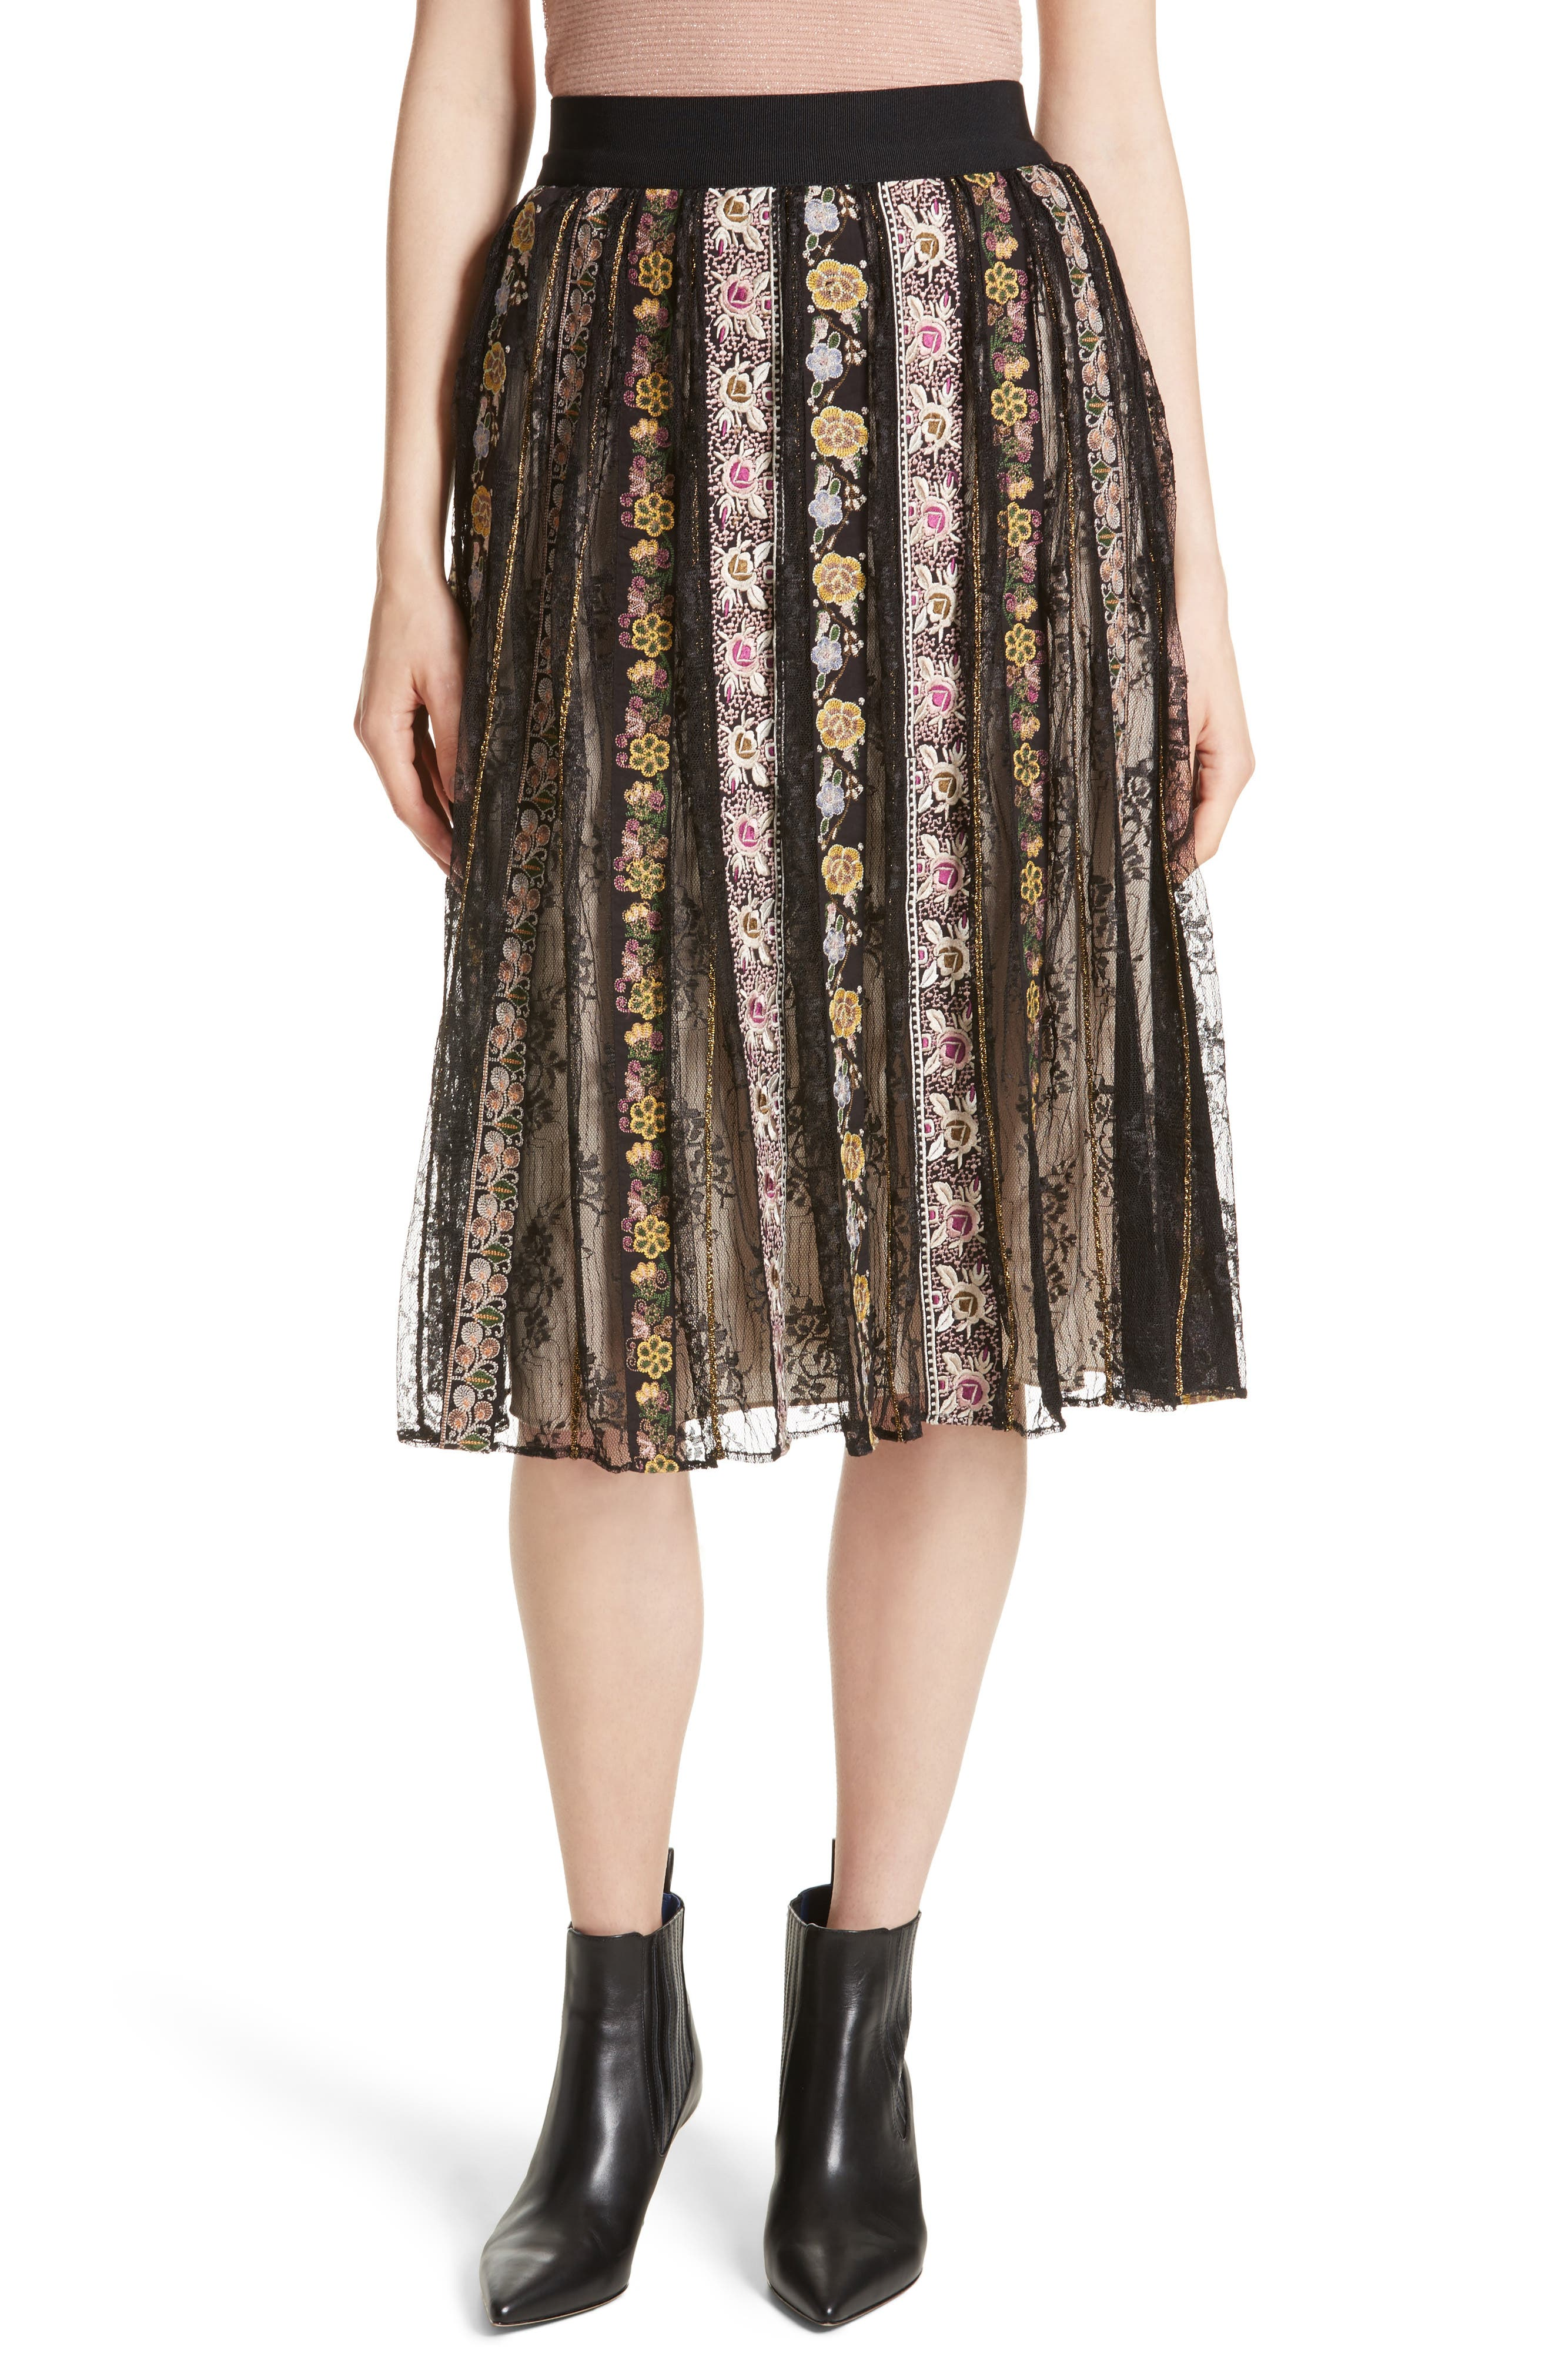 Alternate Image 1 Selected - Alice + Olivia Birdie Flower Embroidered Skirt